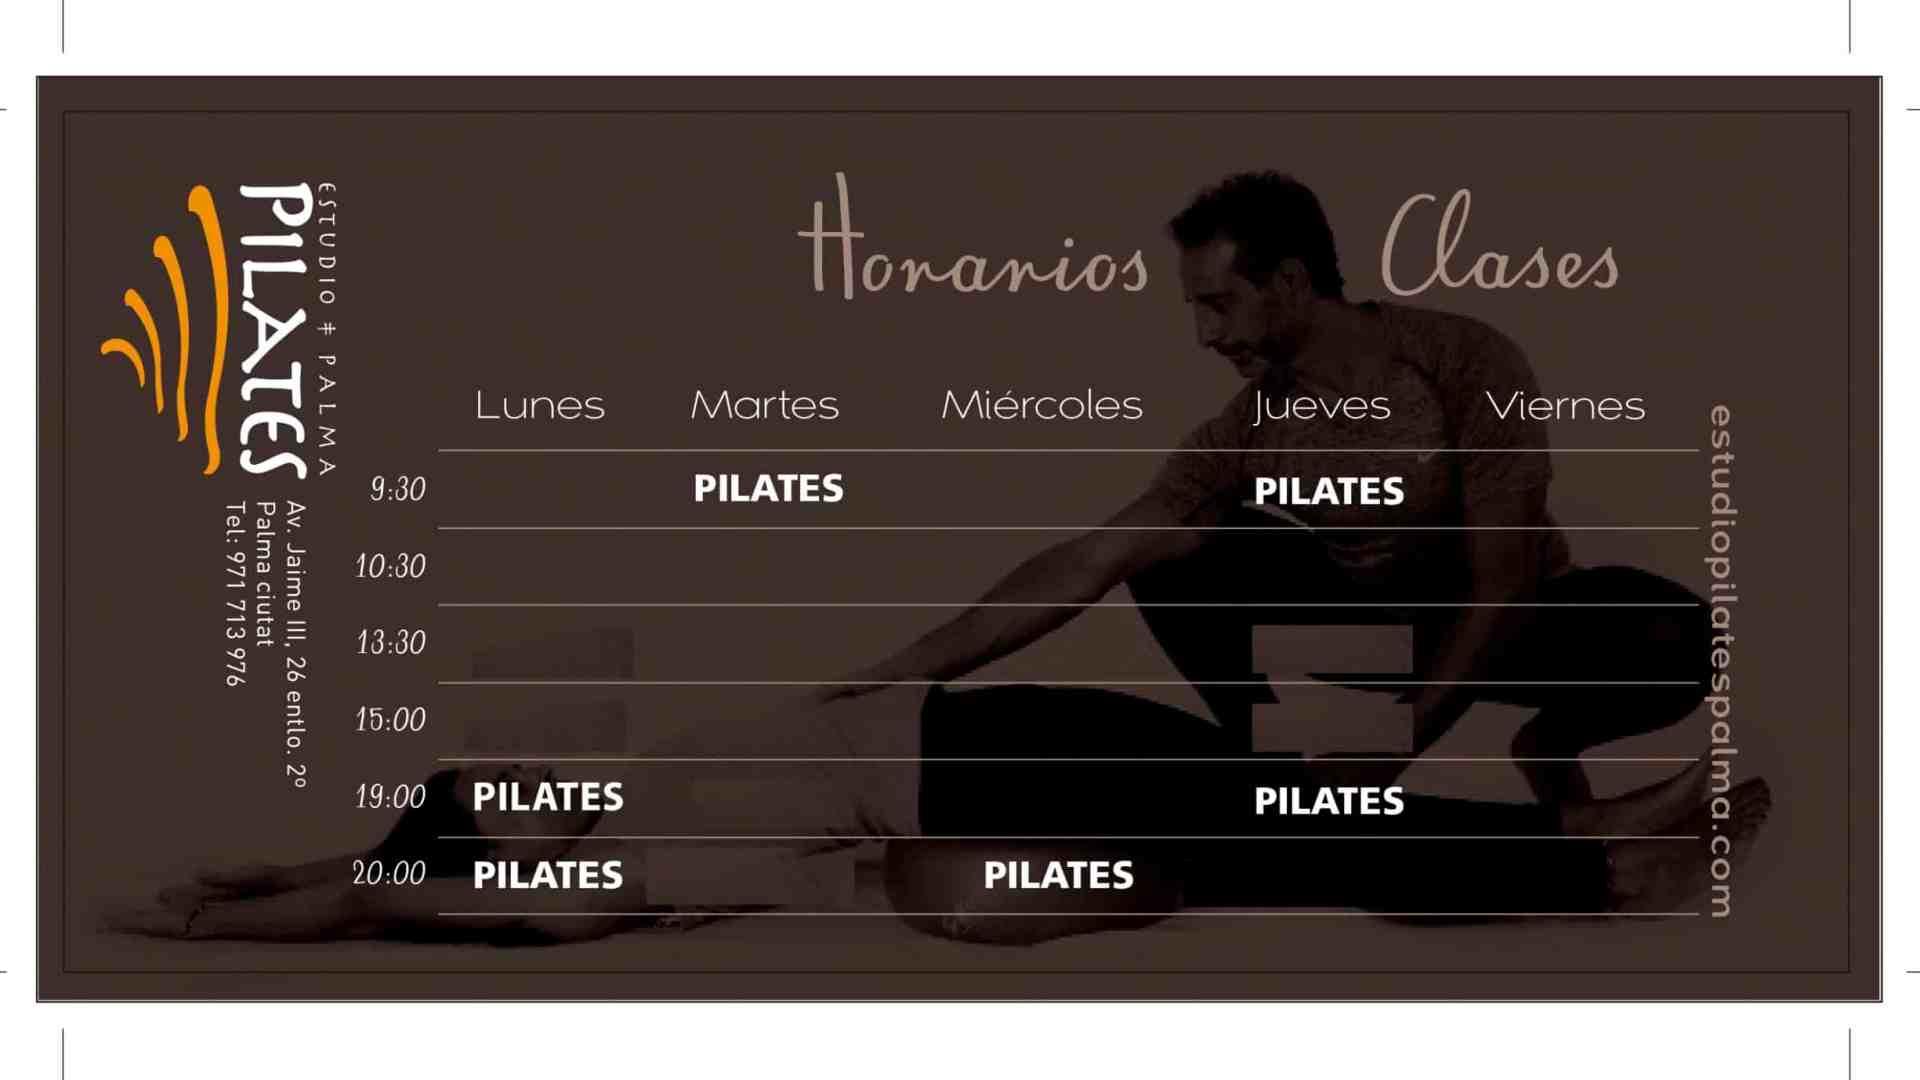 Horario Pilates